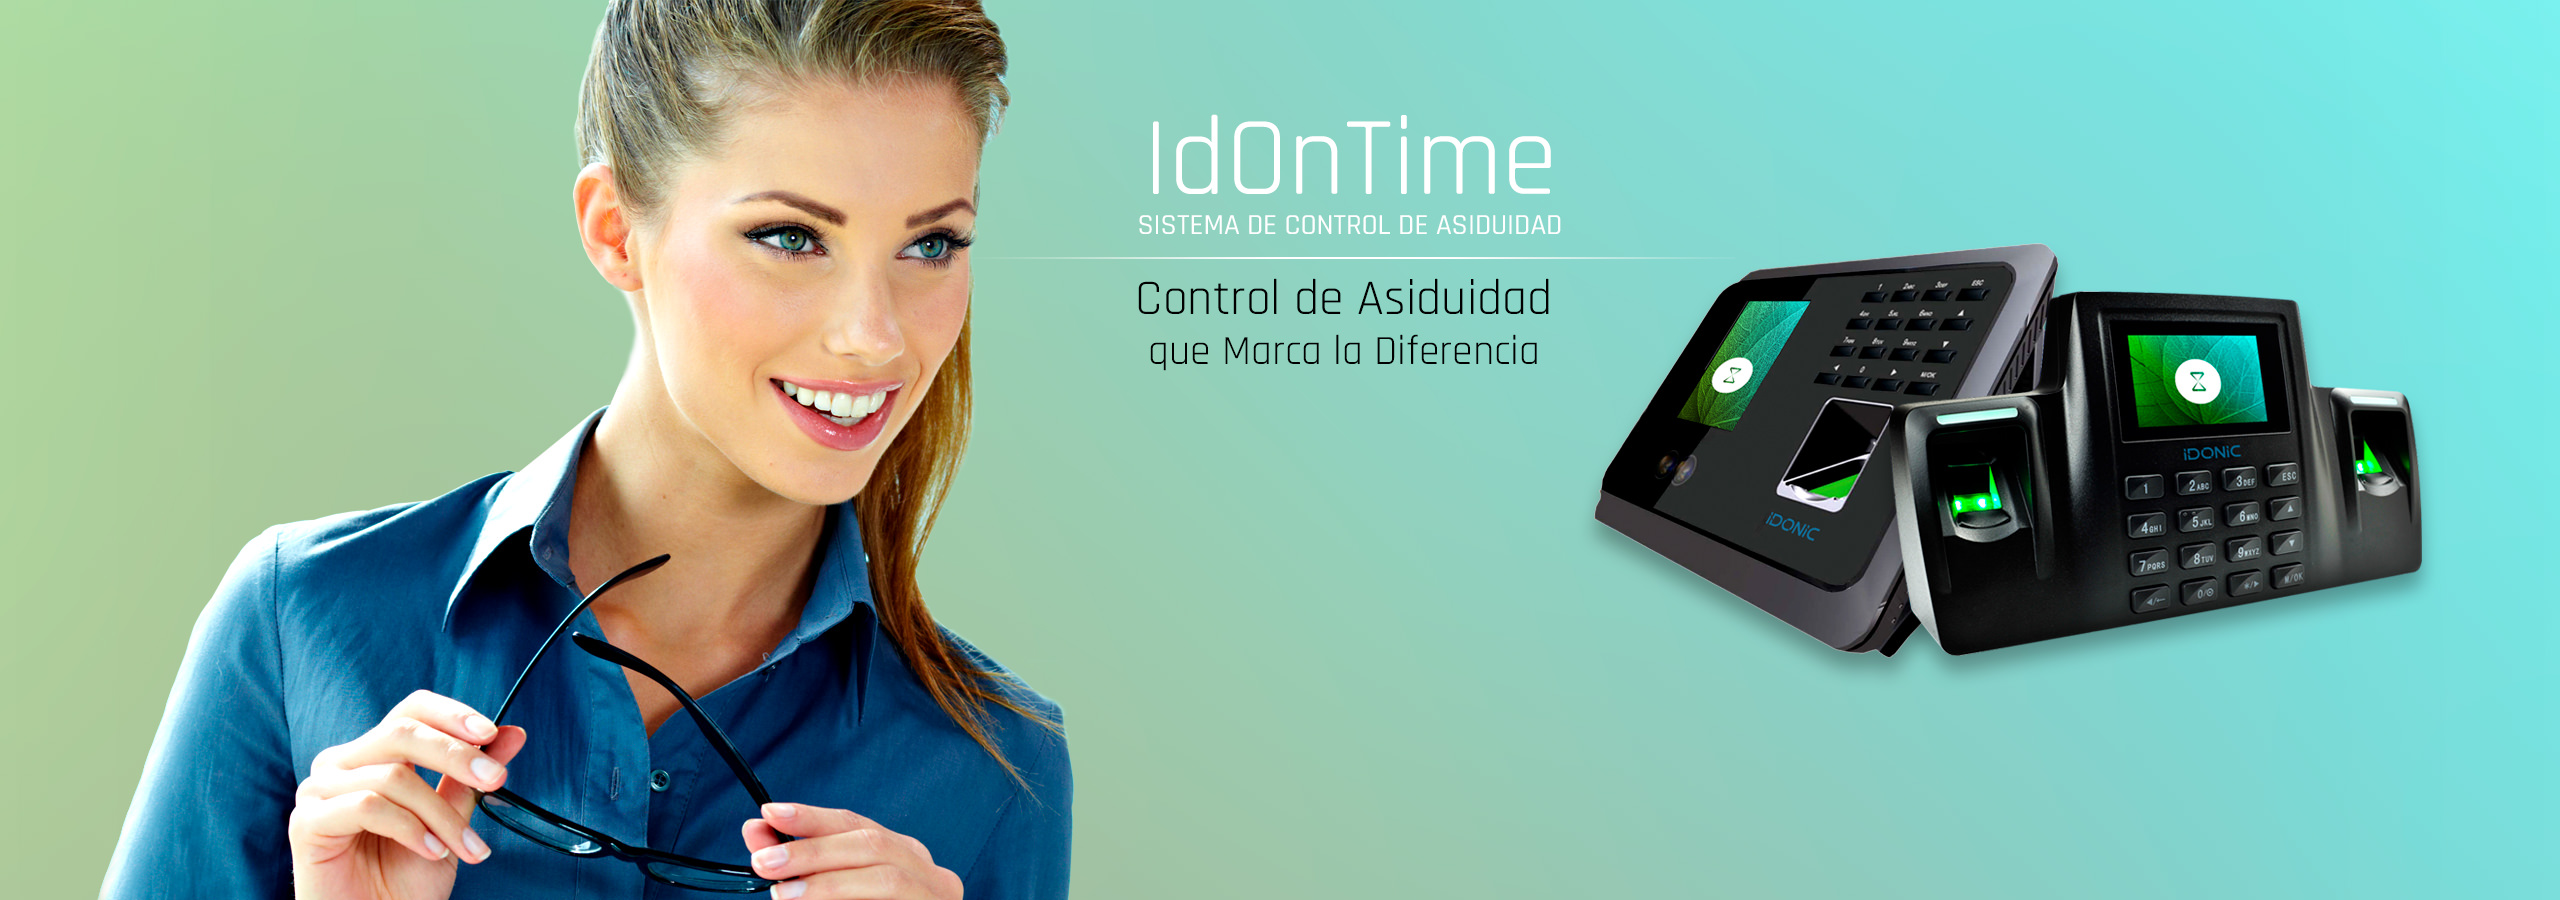 Destaque-Homepage-IdOnTime-ES